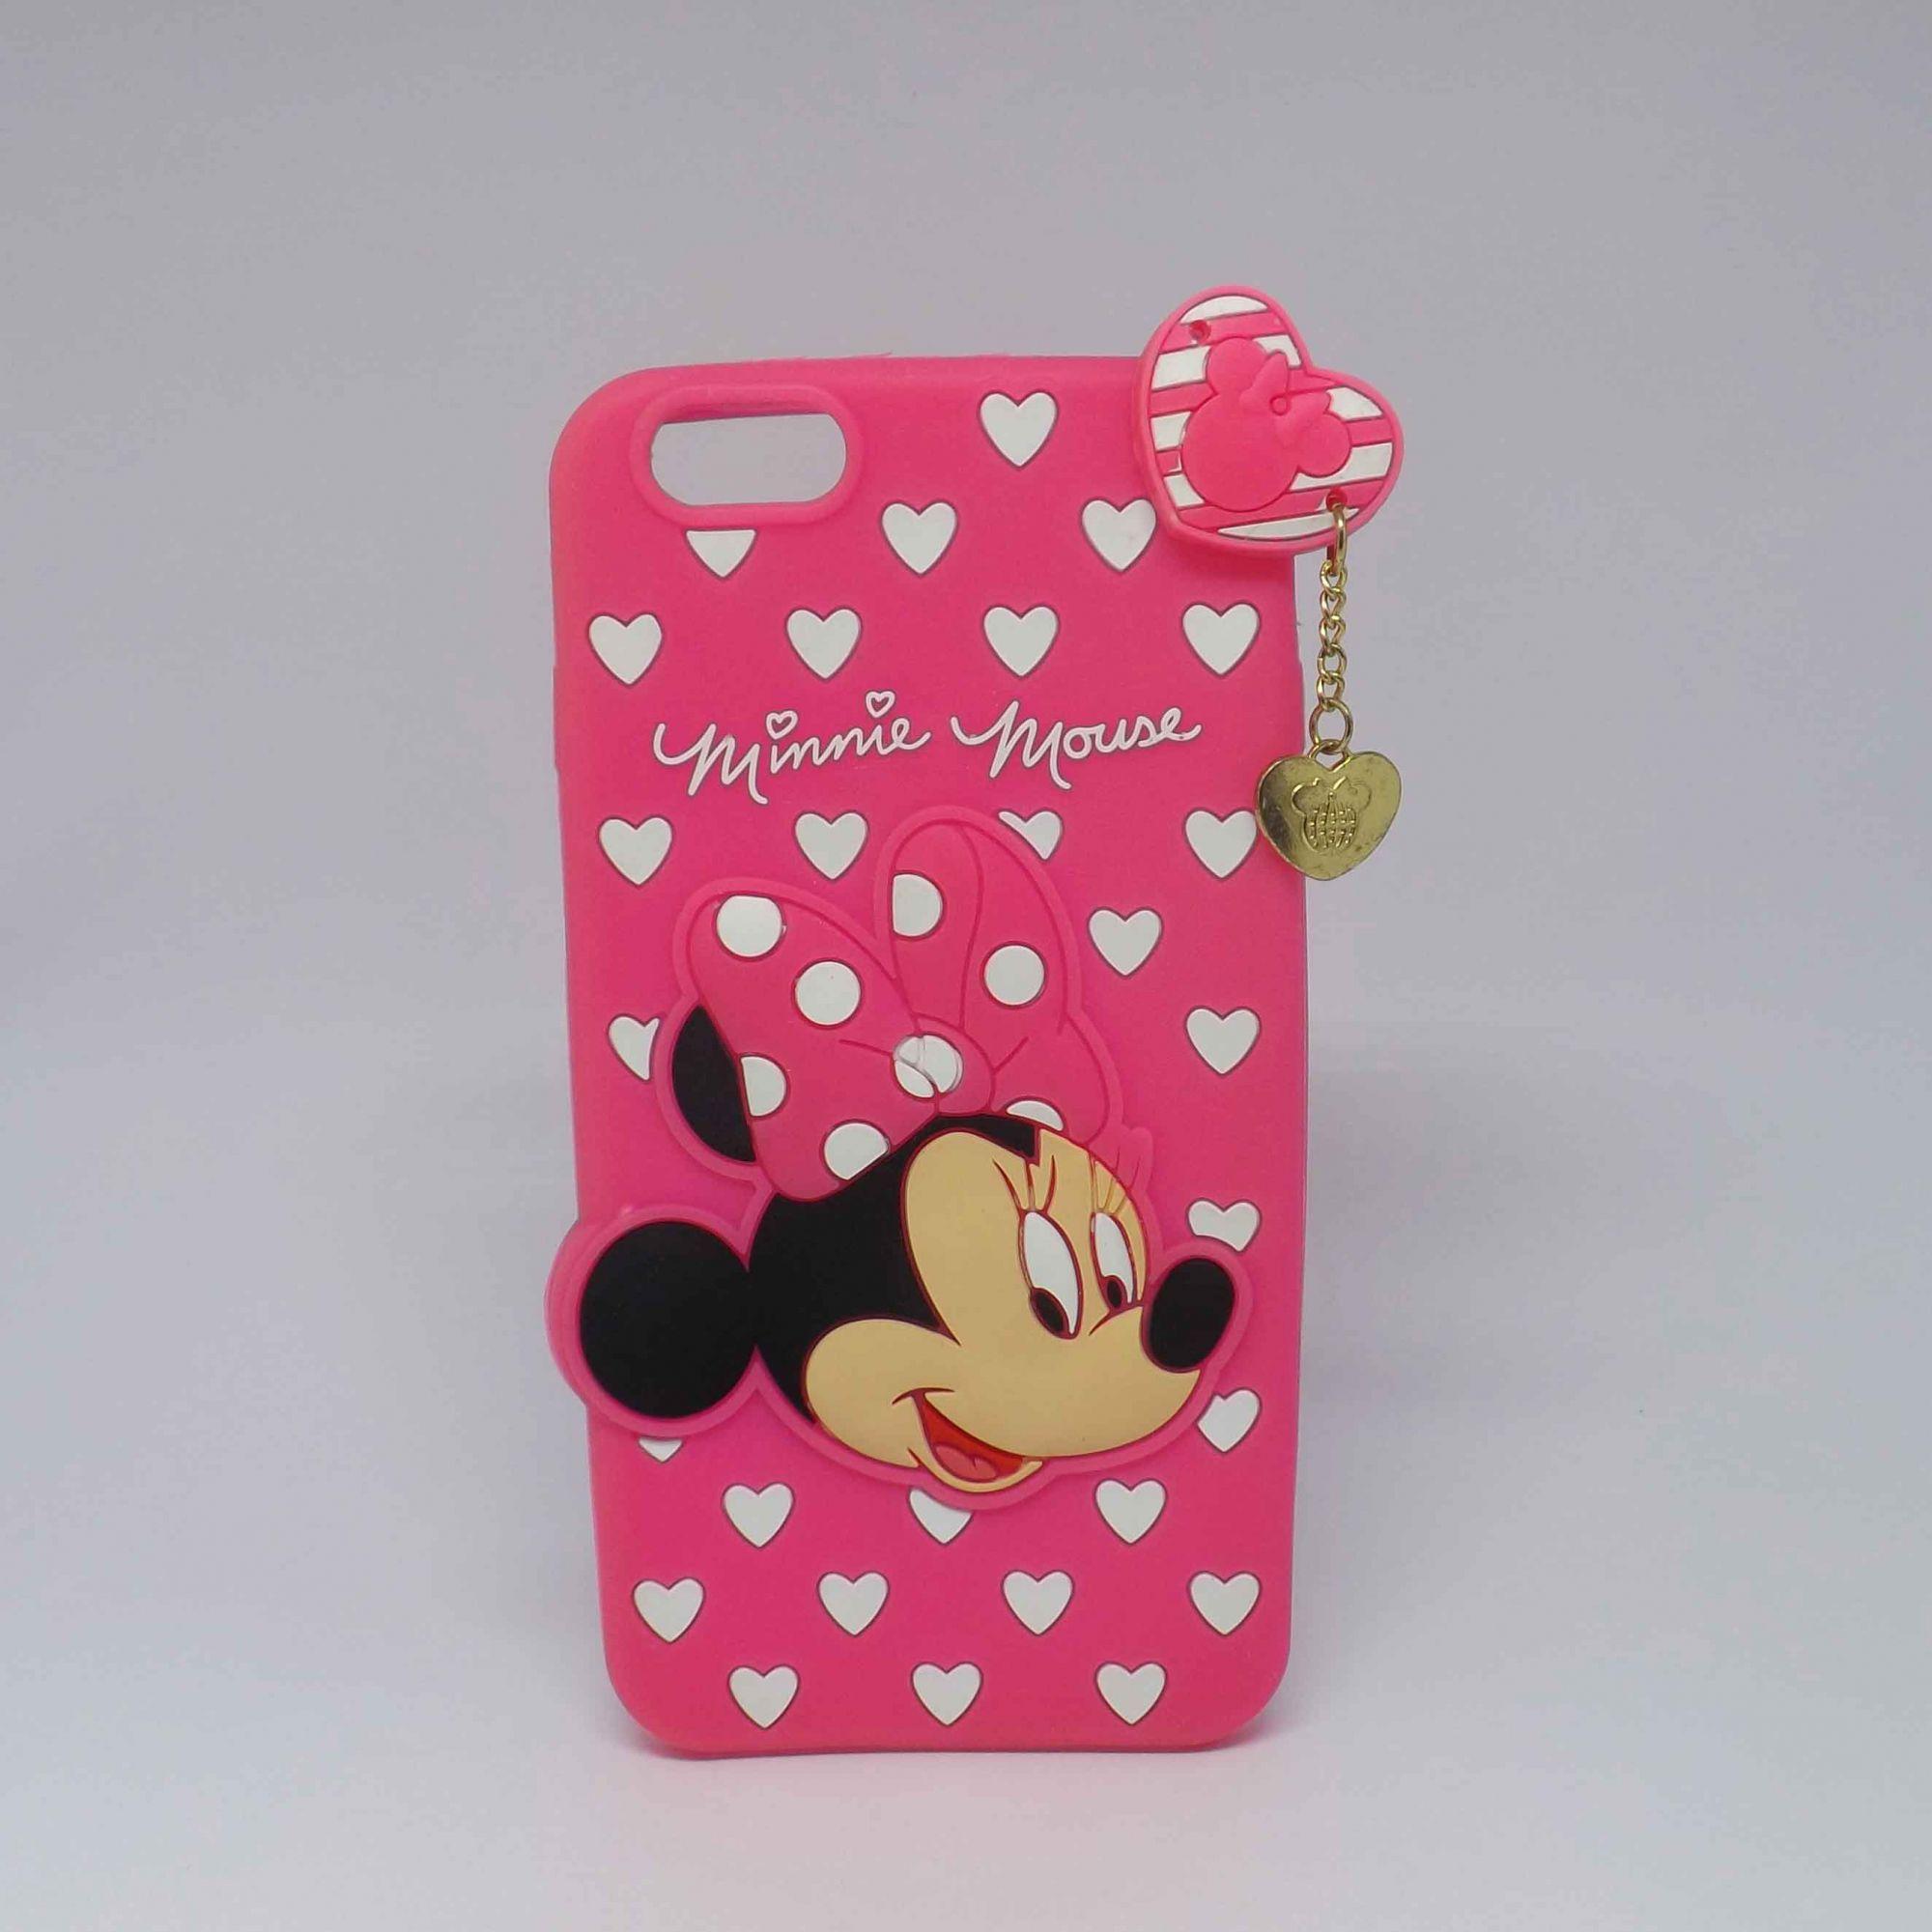 Capa iPhone 6s Plus Personagens -  Minnie